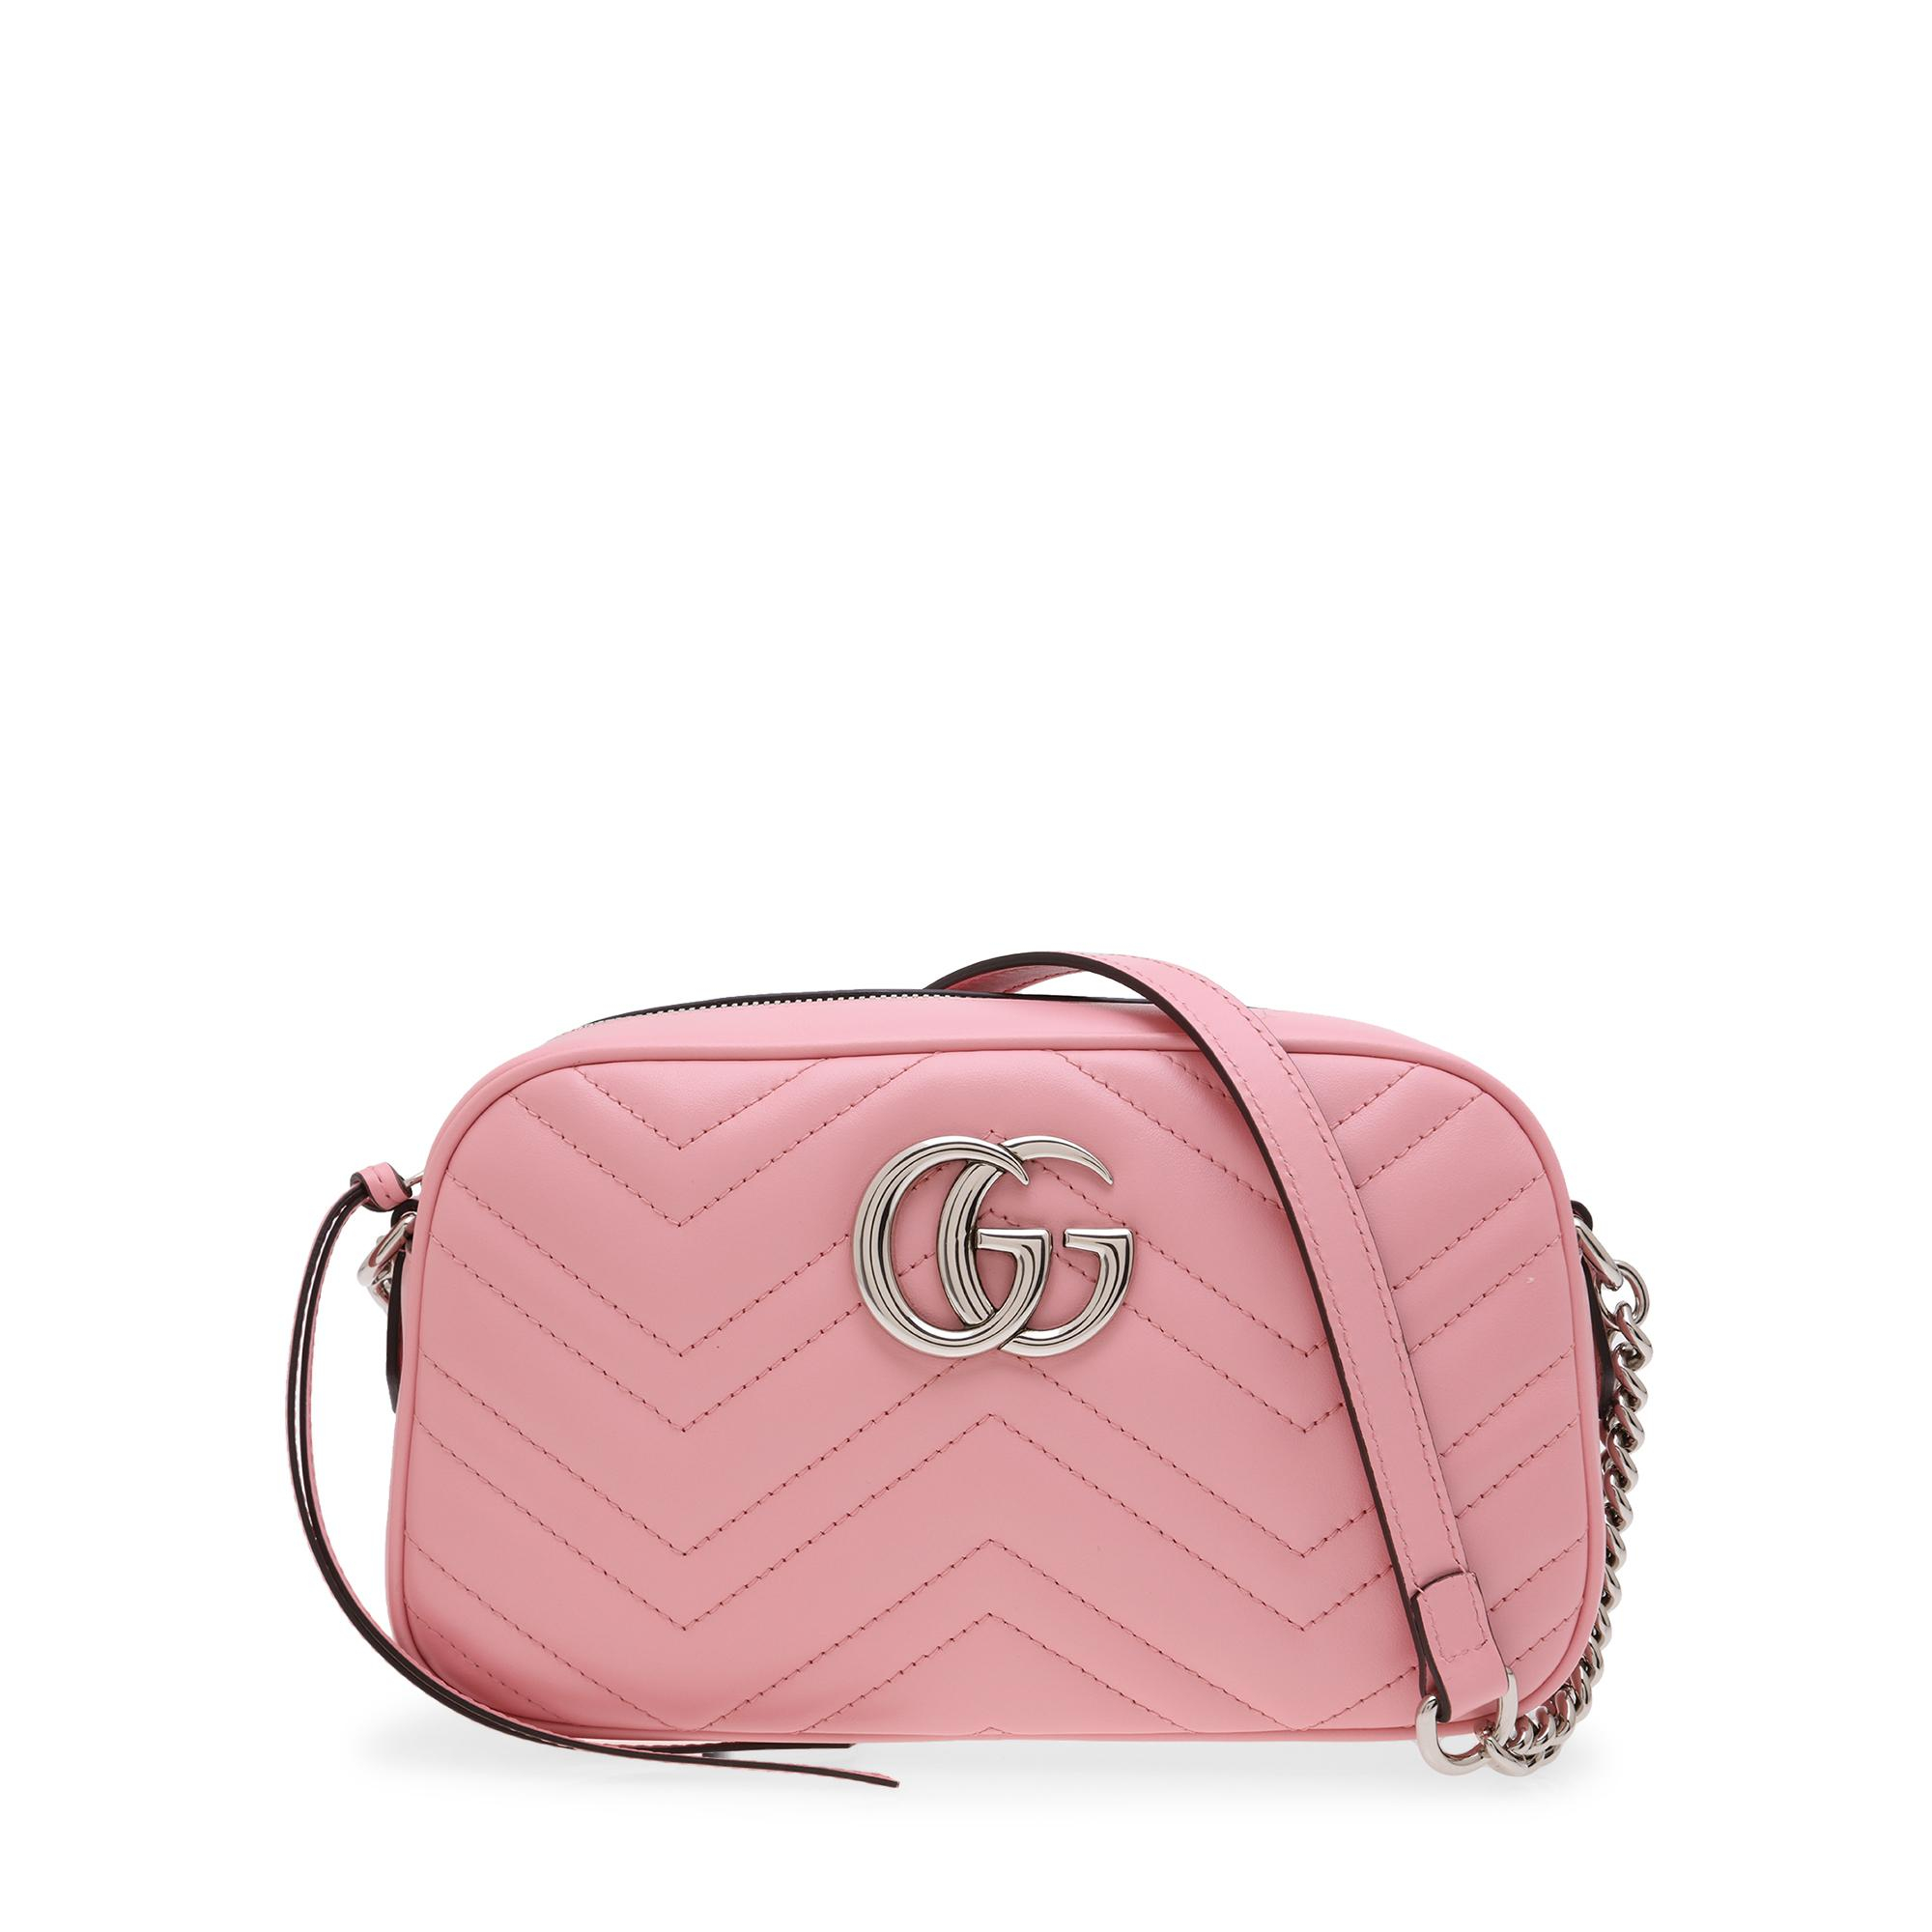 GG Marmont cross-body bag